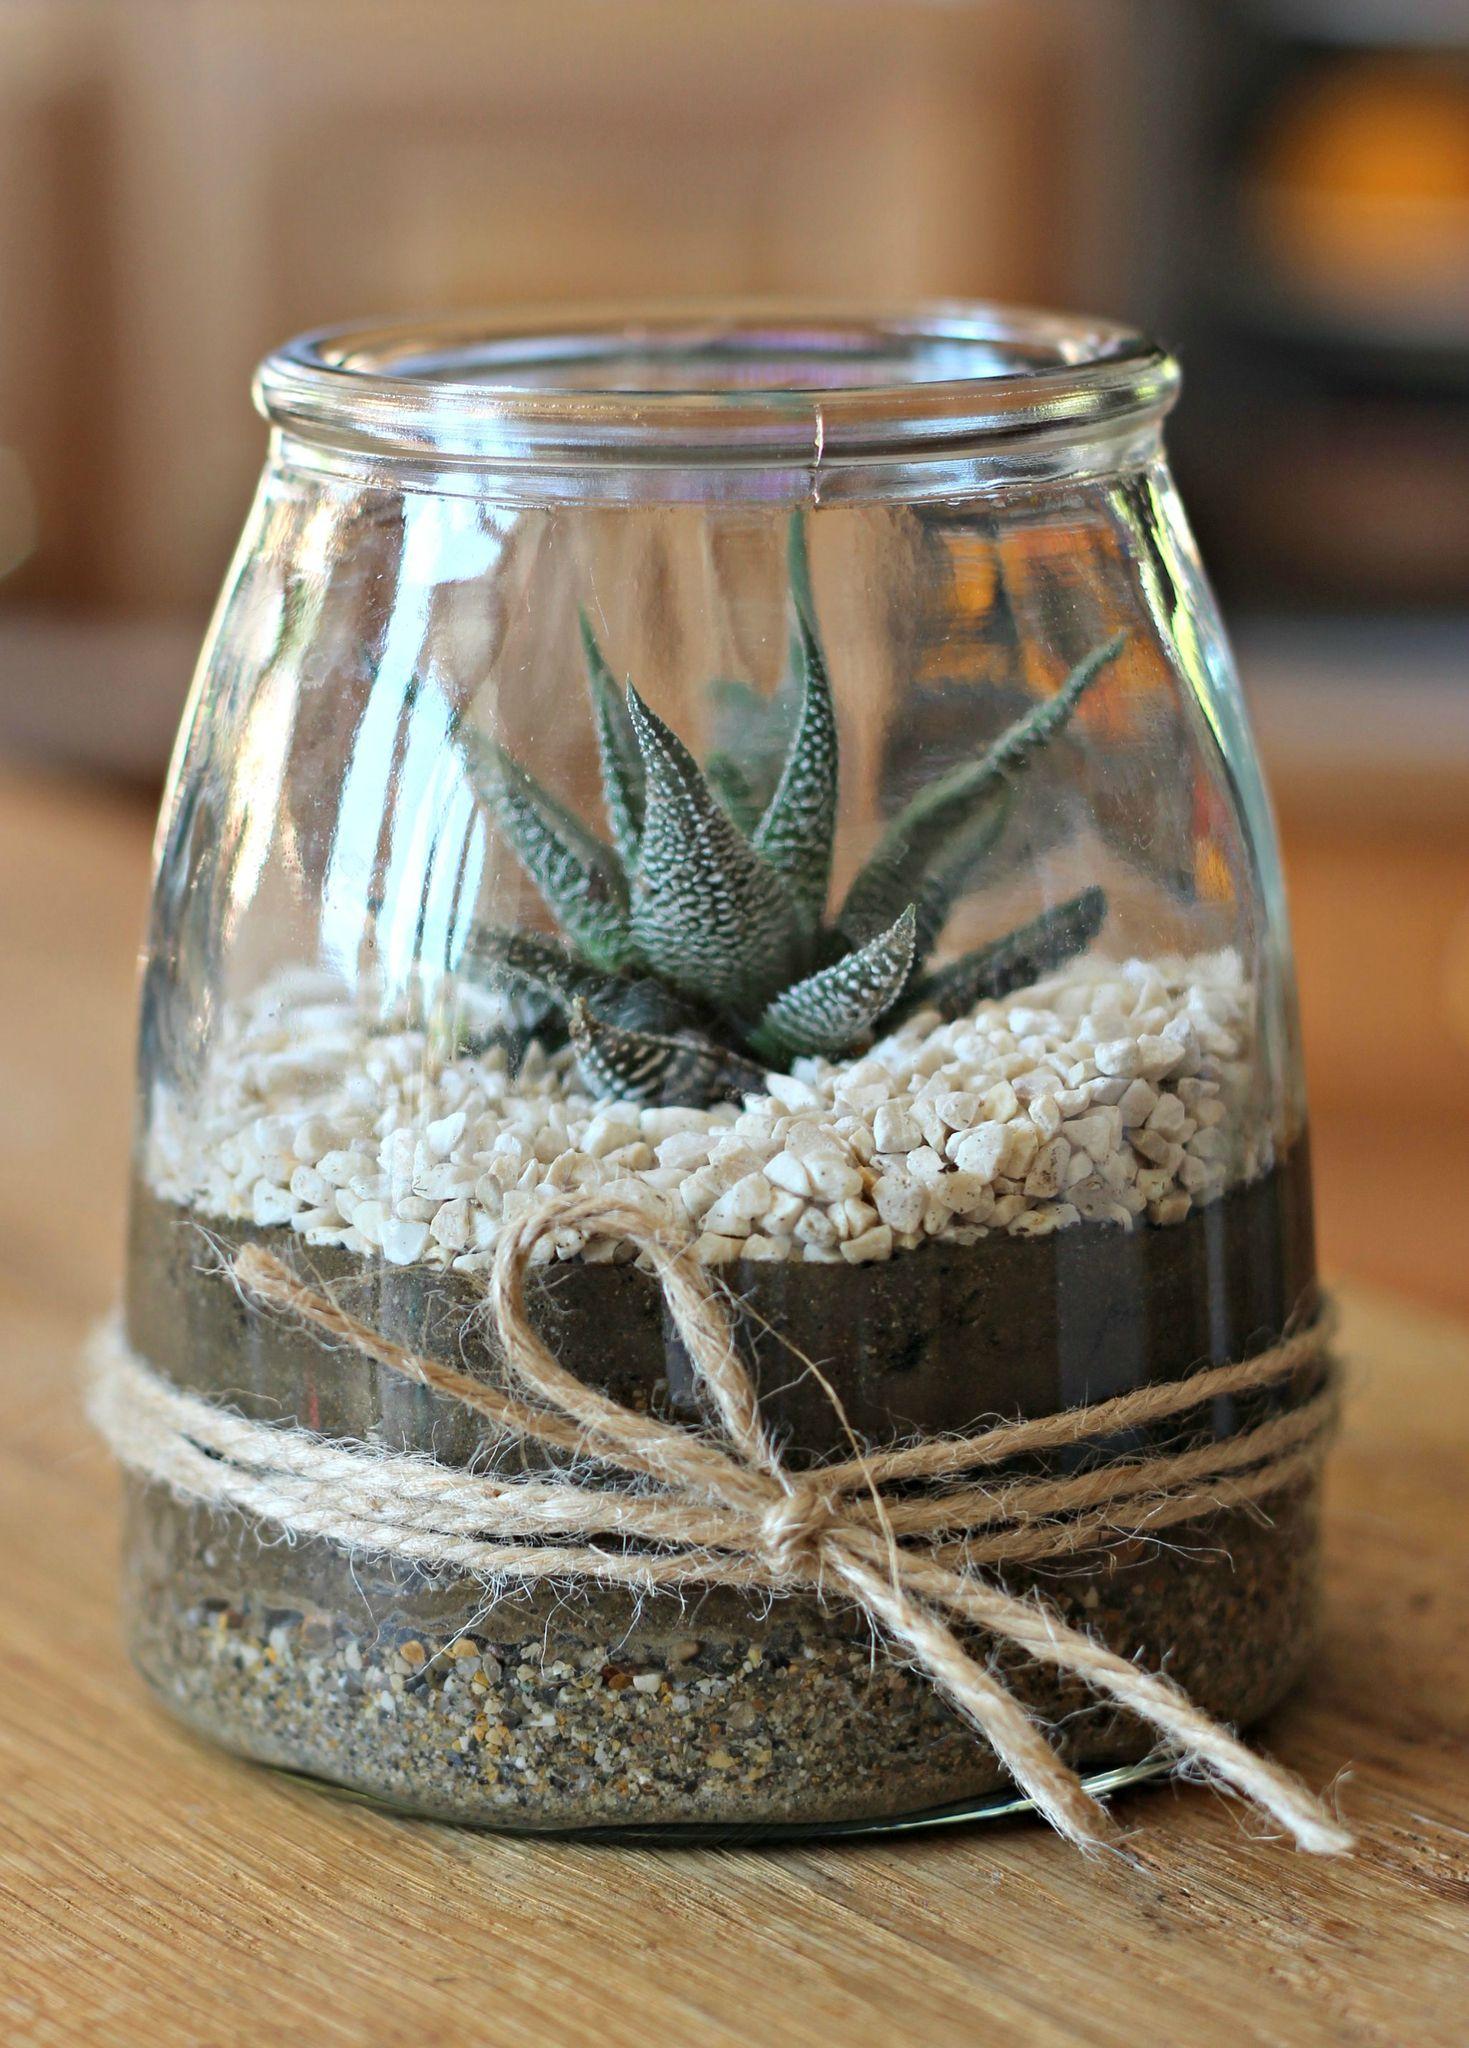 Plantation De Succulente : Diy Végétal & Cadeau Gourmand tout Idée Cadeau Jardin